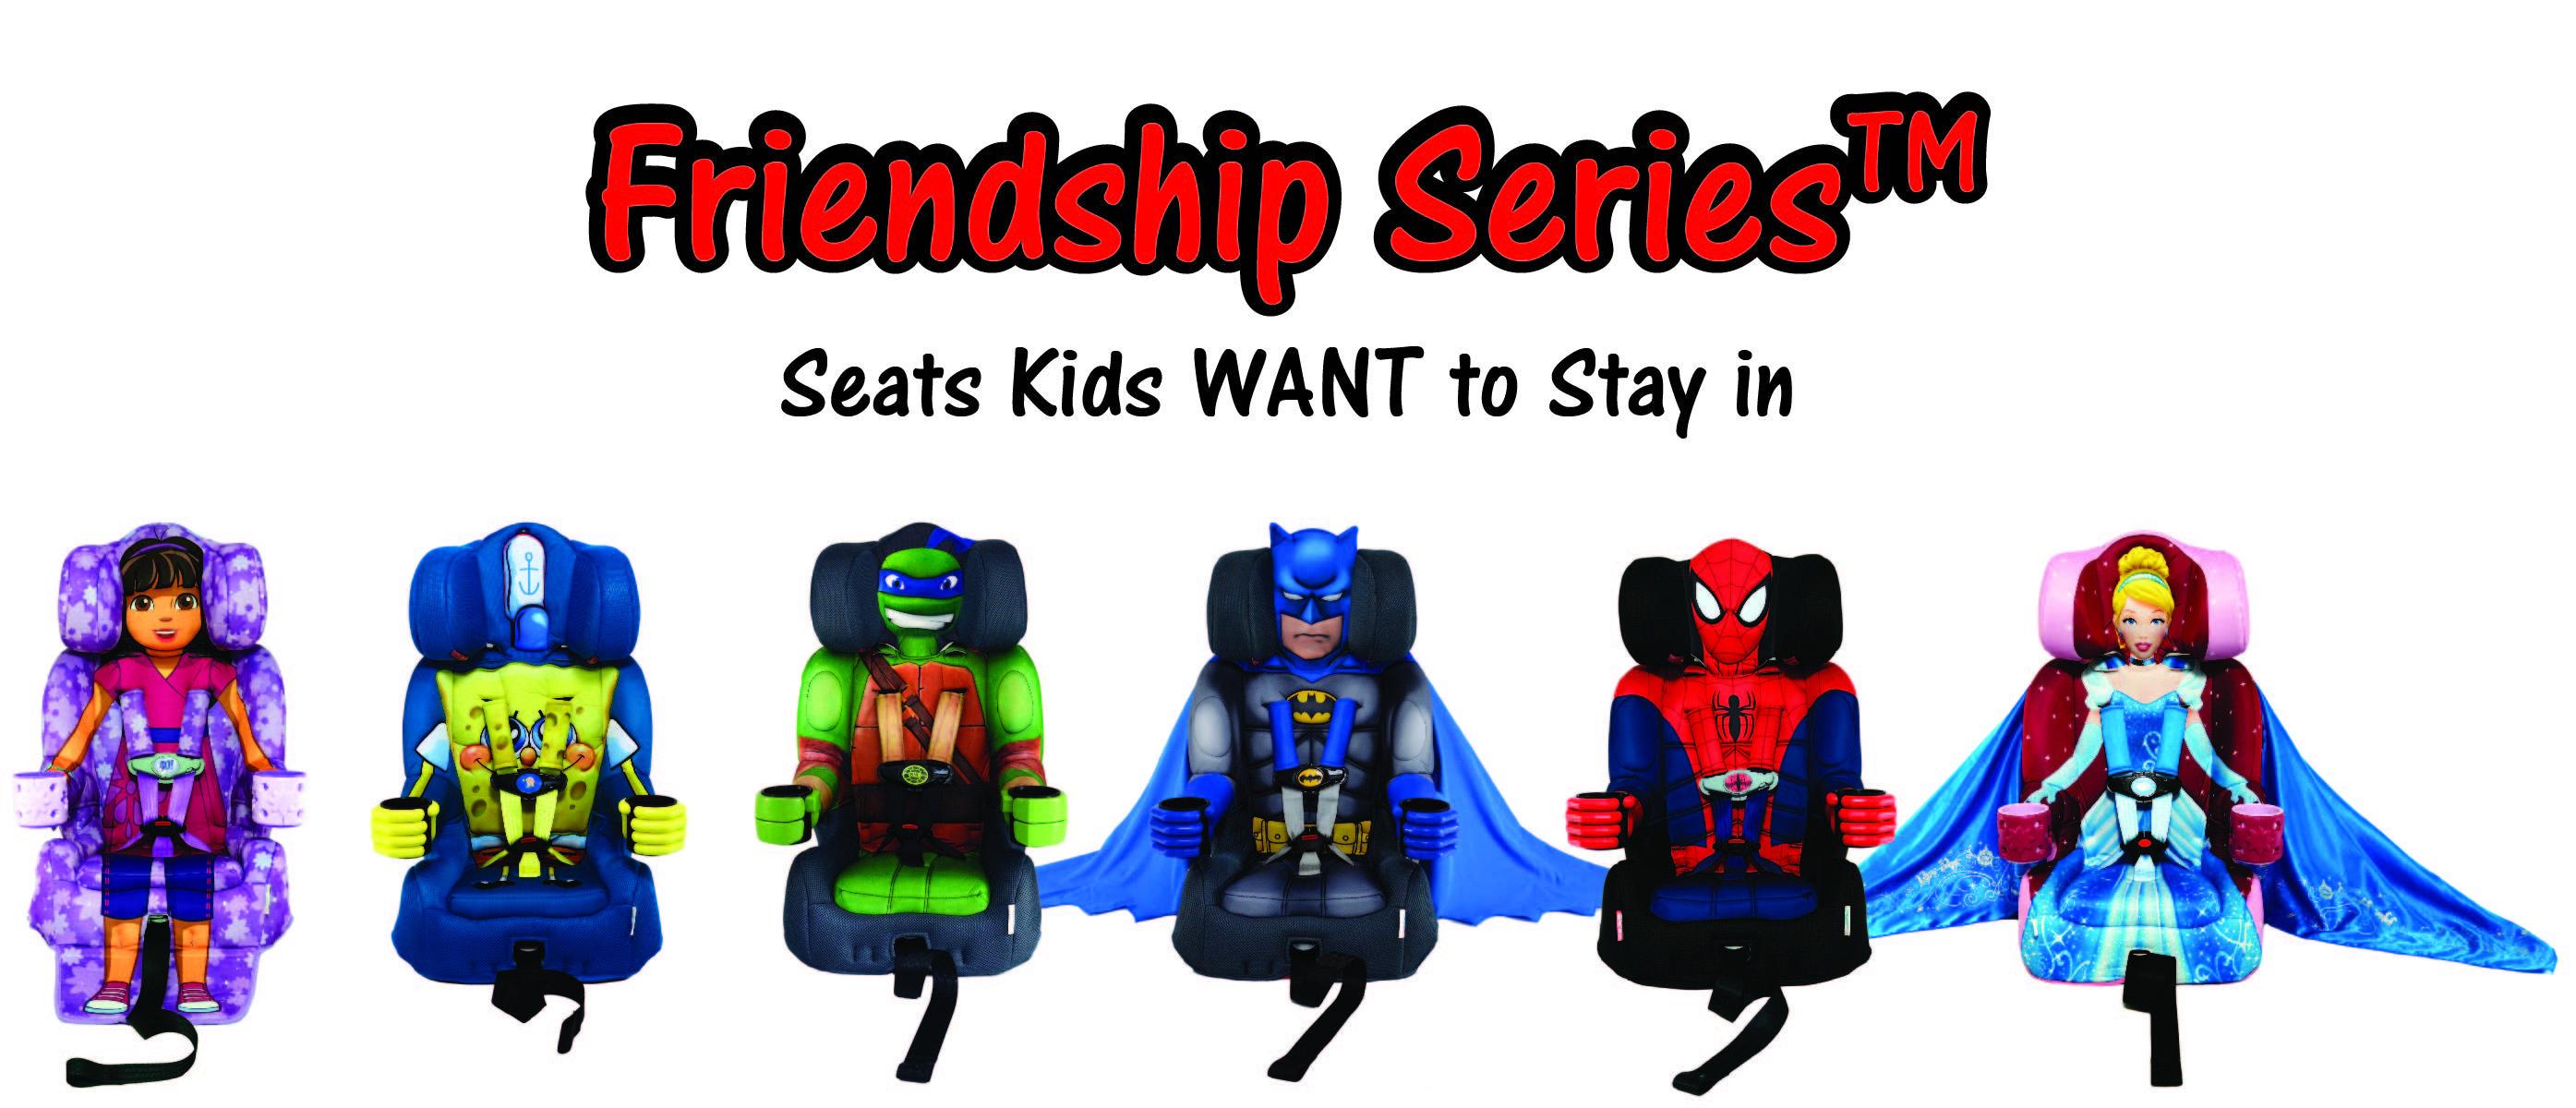 Friendship Seats